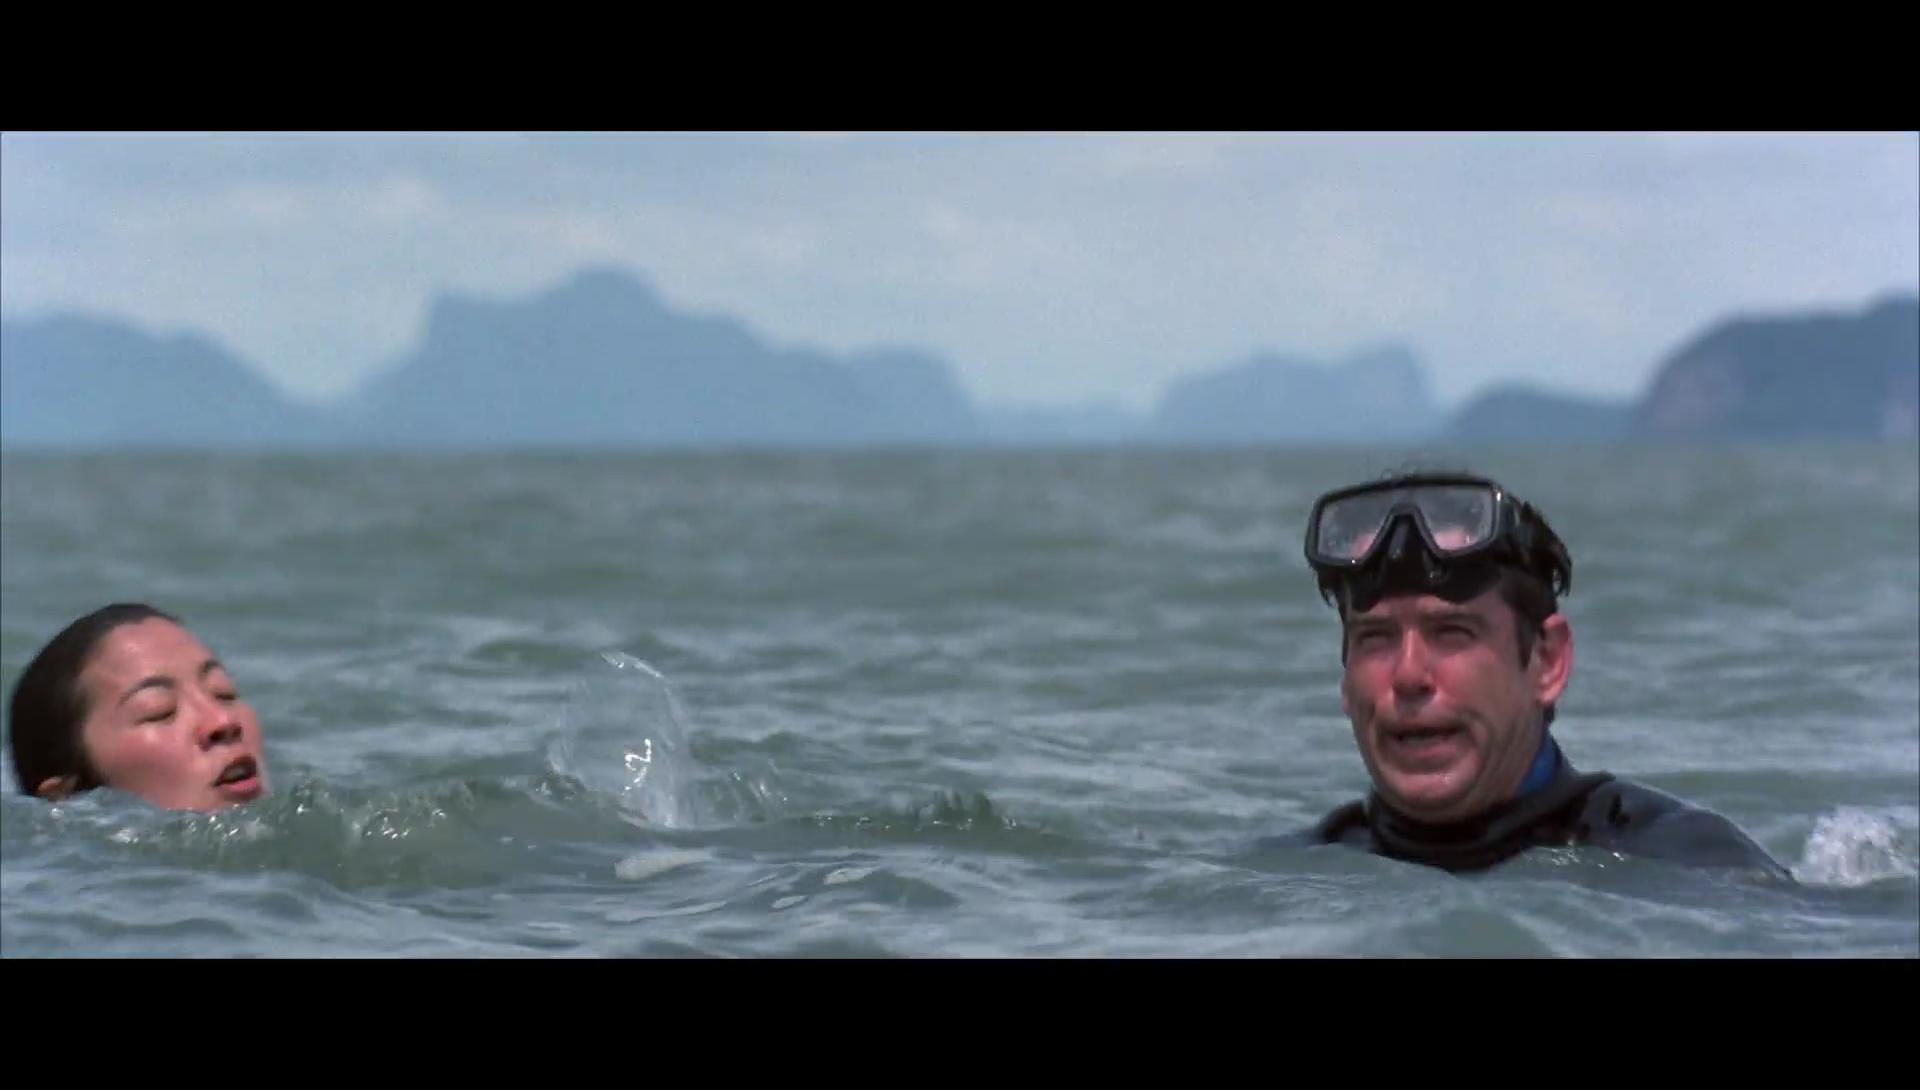 007 El Mañana Nunca Muere 1080p Lat-Cast-Ing 5.1 (1997)